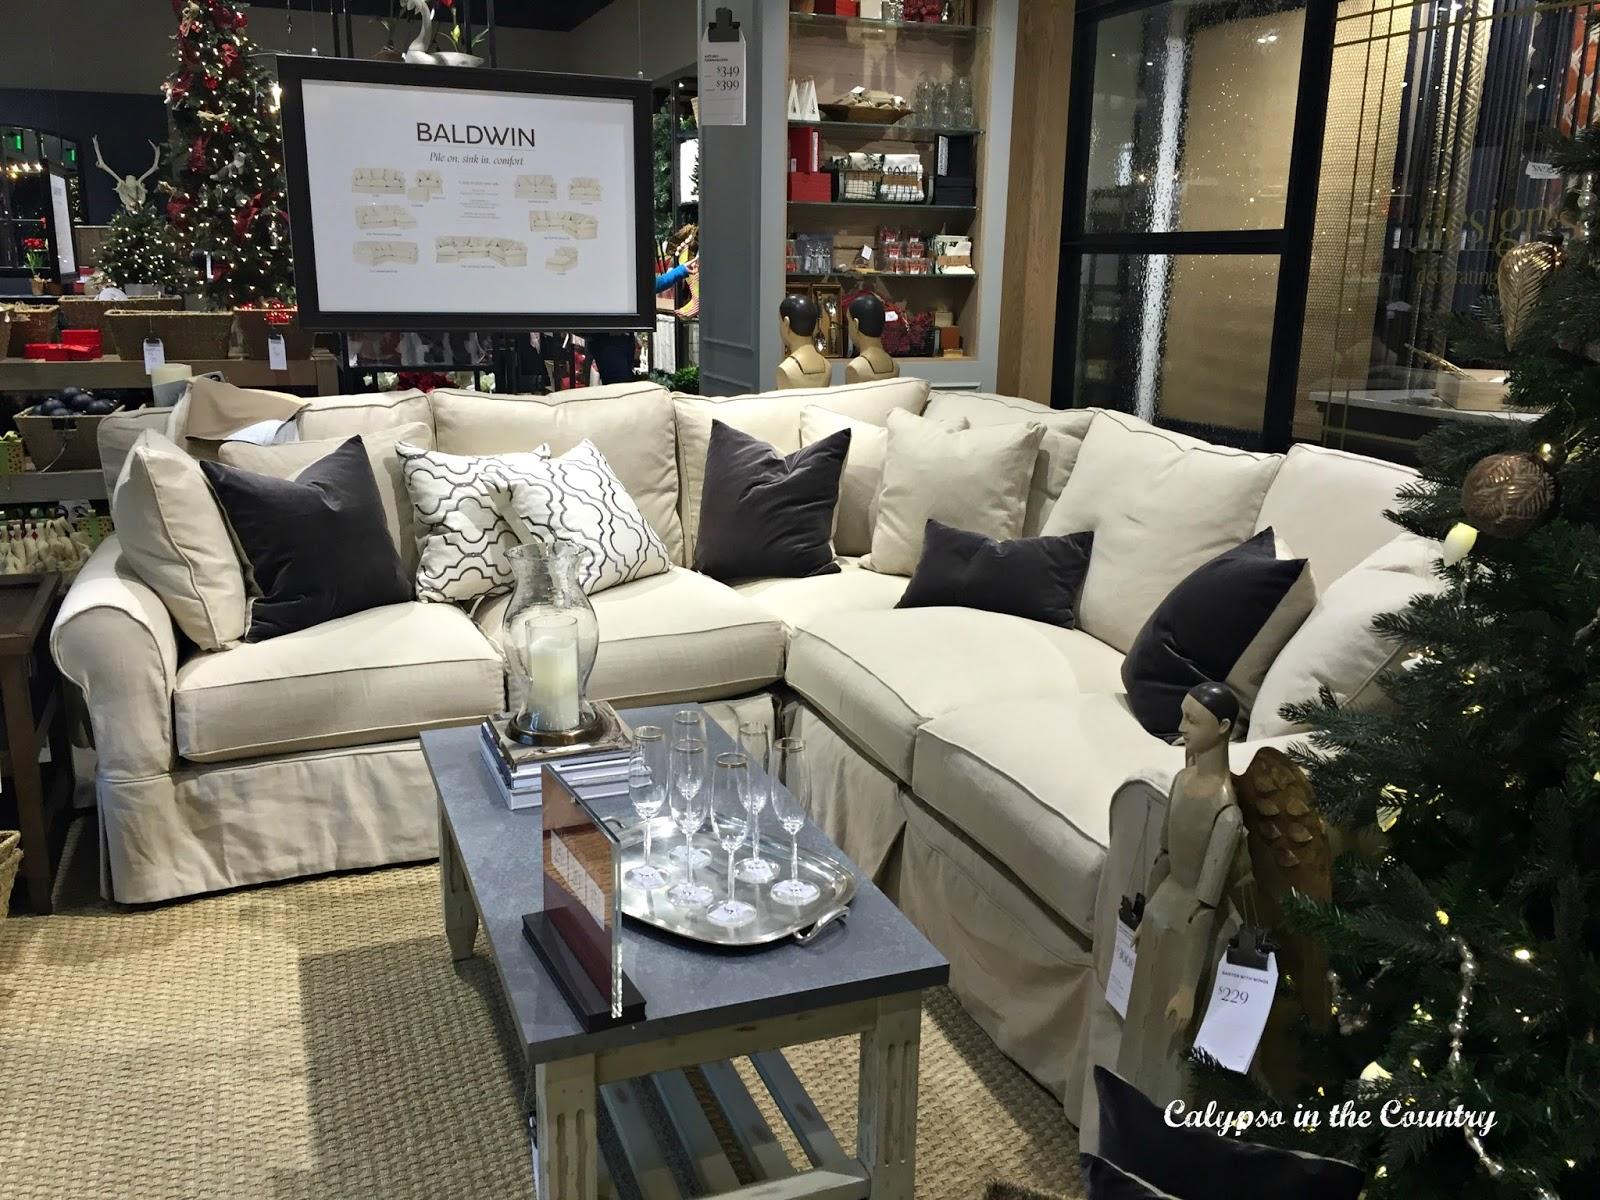 100 ballard designs ballard designs rug roselawnlutheran ballard designs ballard designs sofa reviews